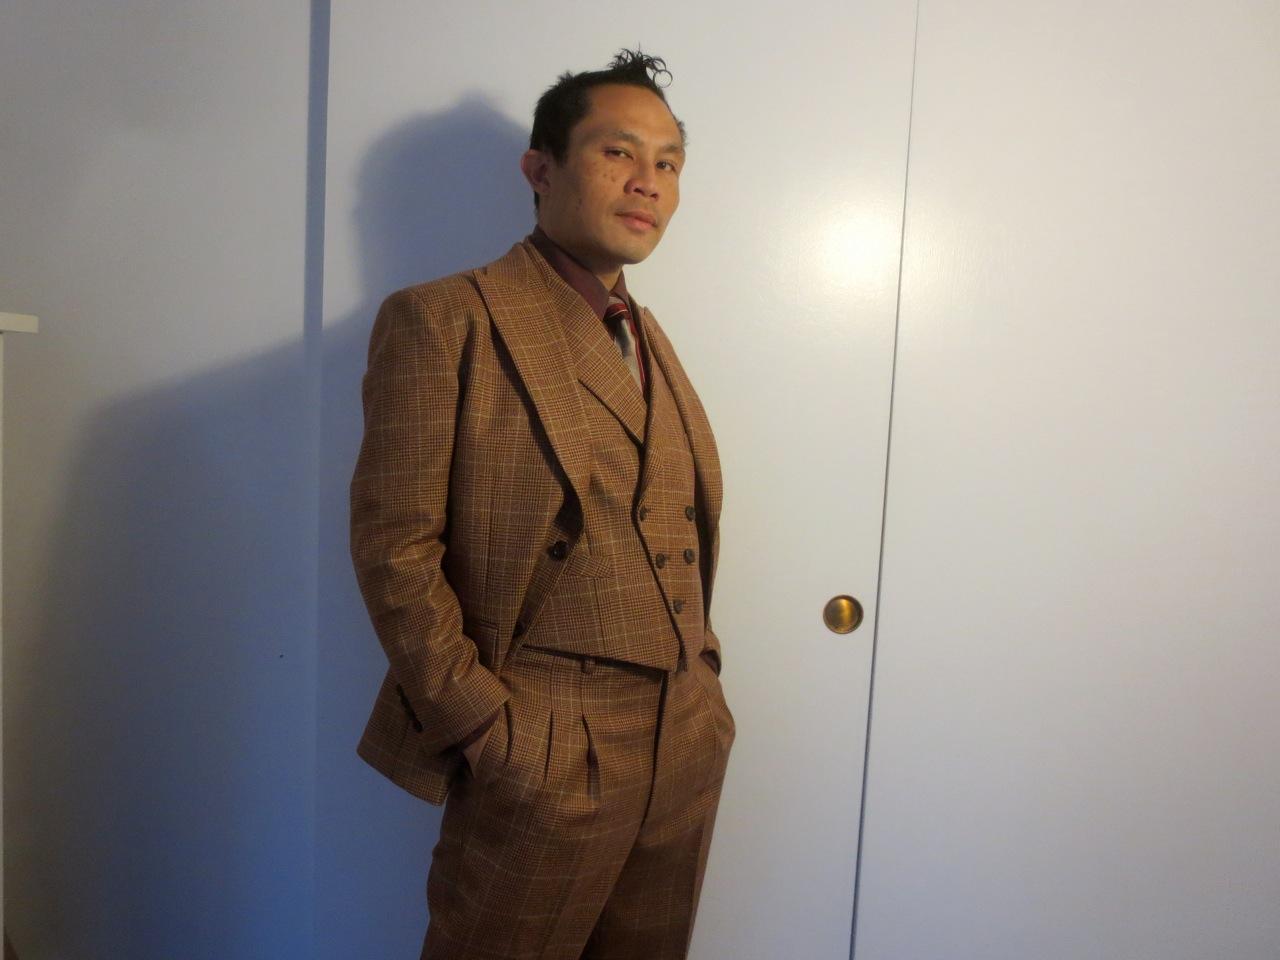 Full suit unbottoned